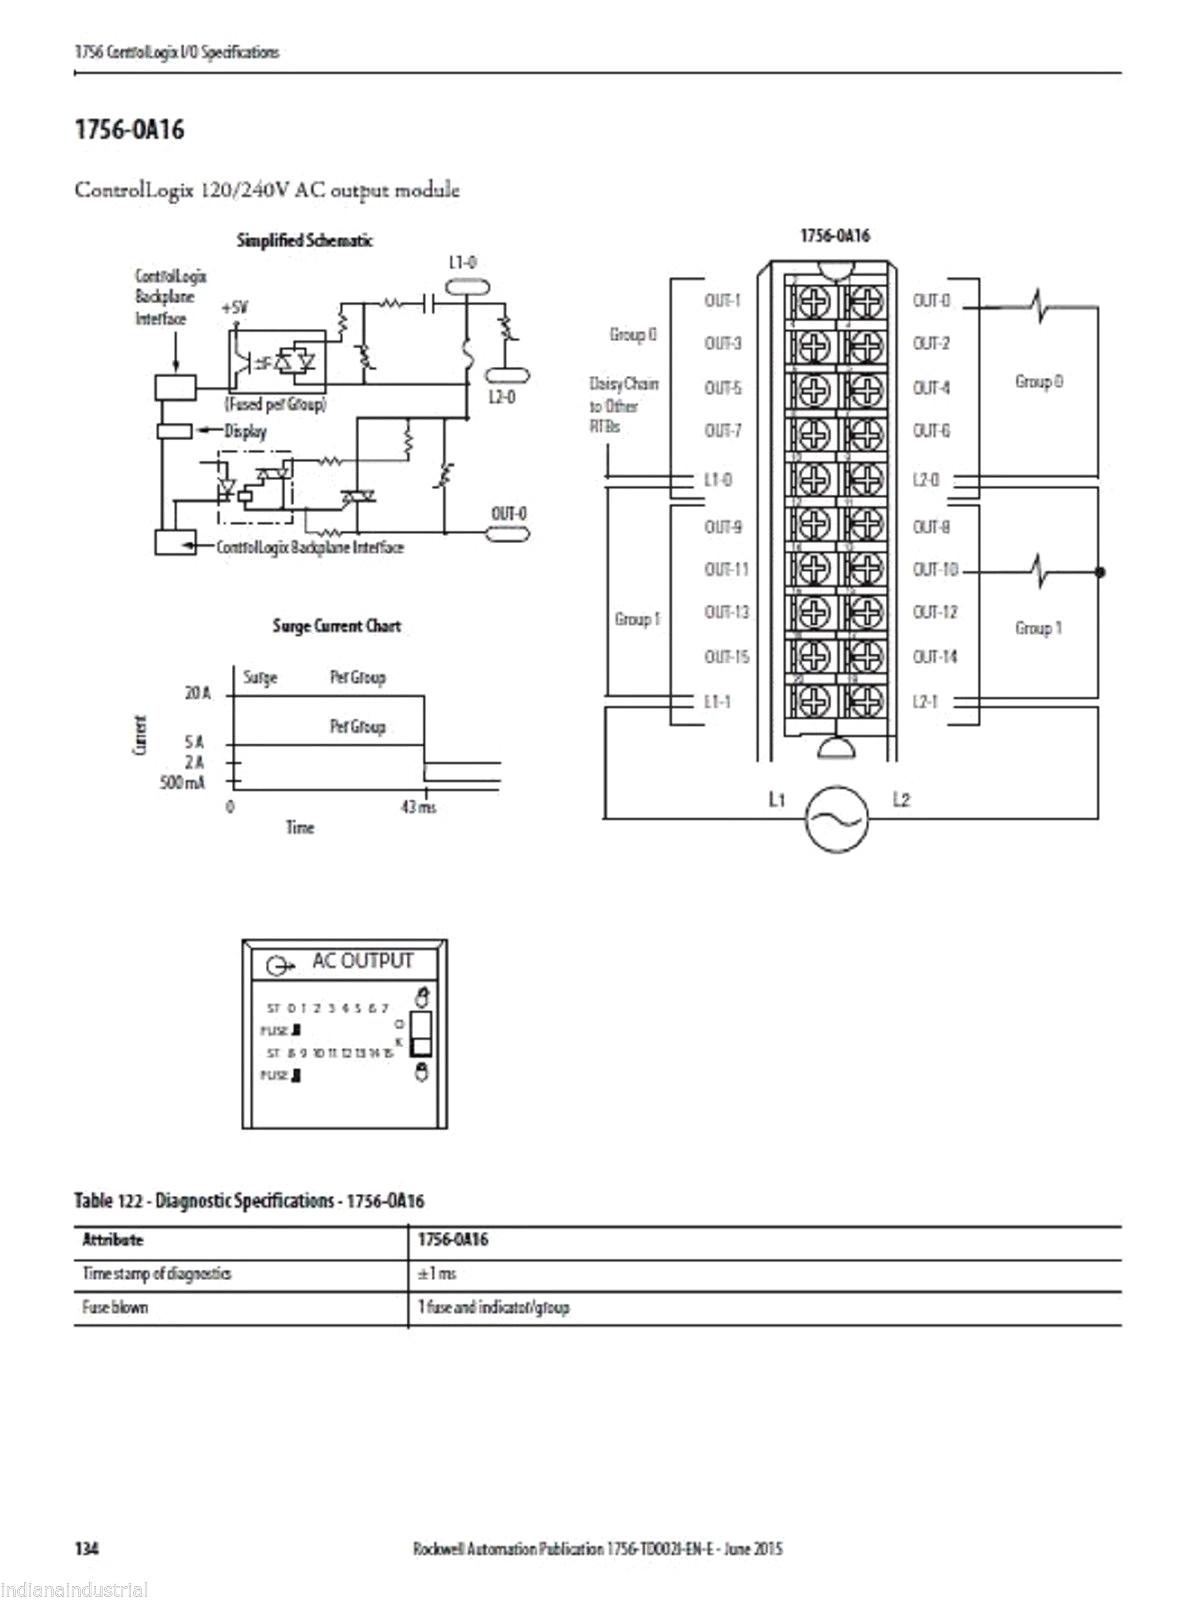 5069 Ib16 Wiring Diagram - Modern Home Interior Design Ideas ... Ab V Wiring Diagram on